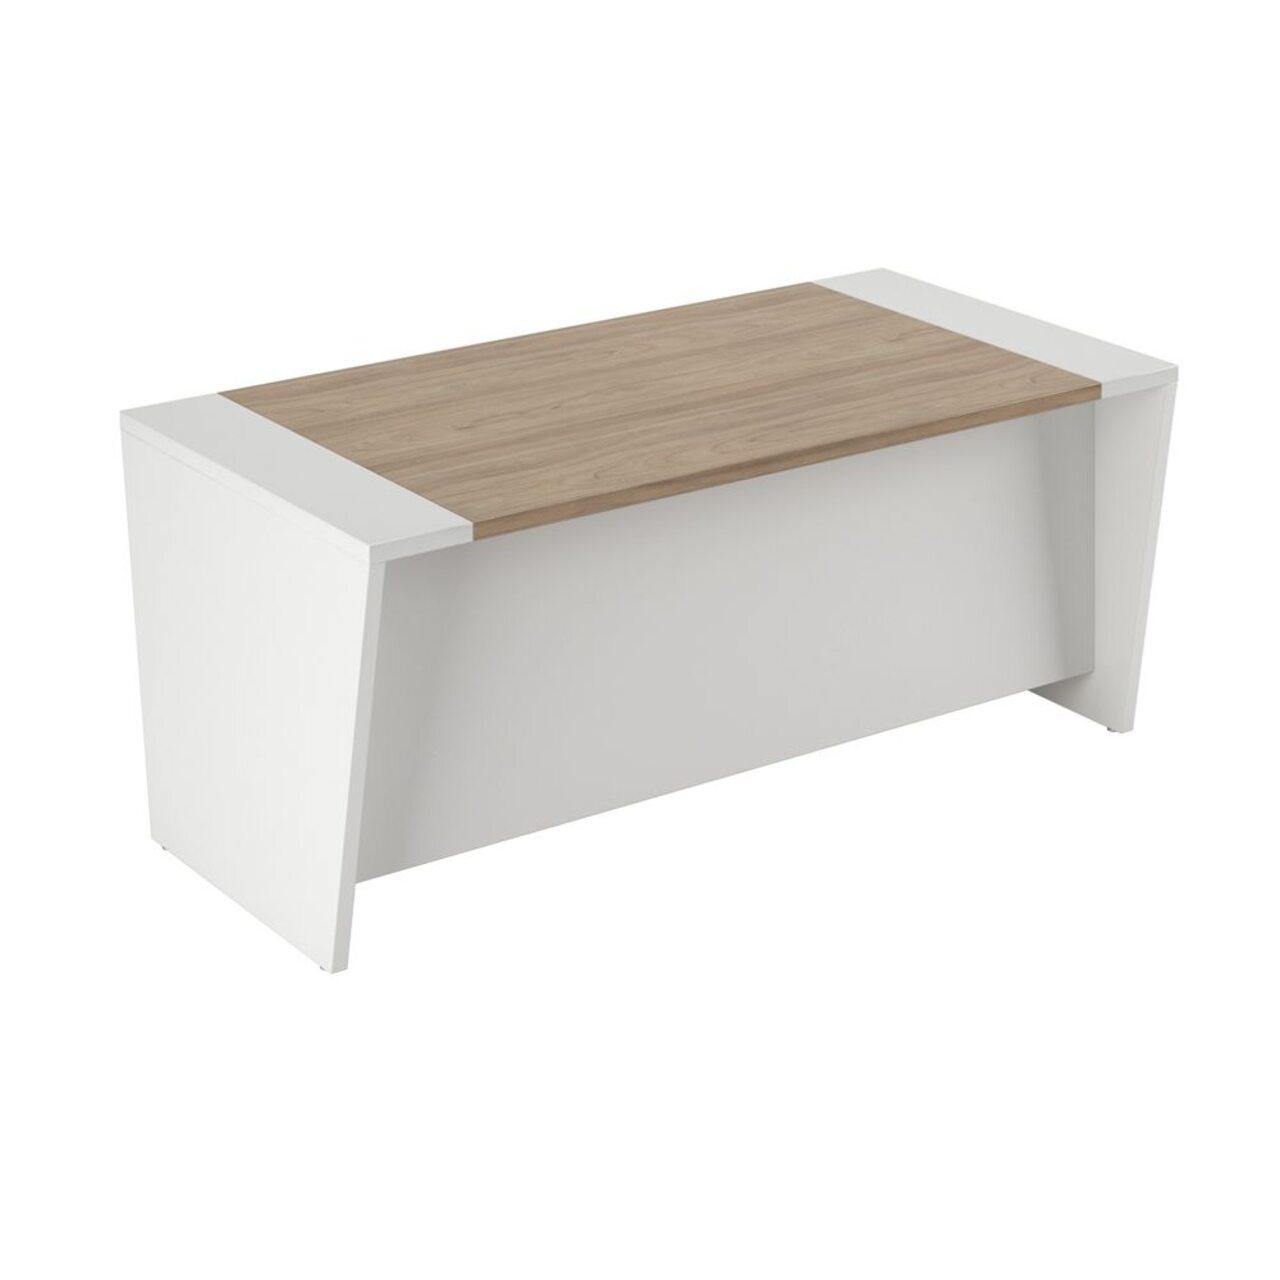 Стол письменный 180 (панель глянец)  ASTI 180x90x75 - фото 1